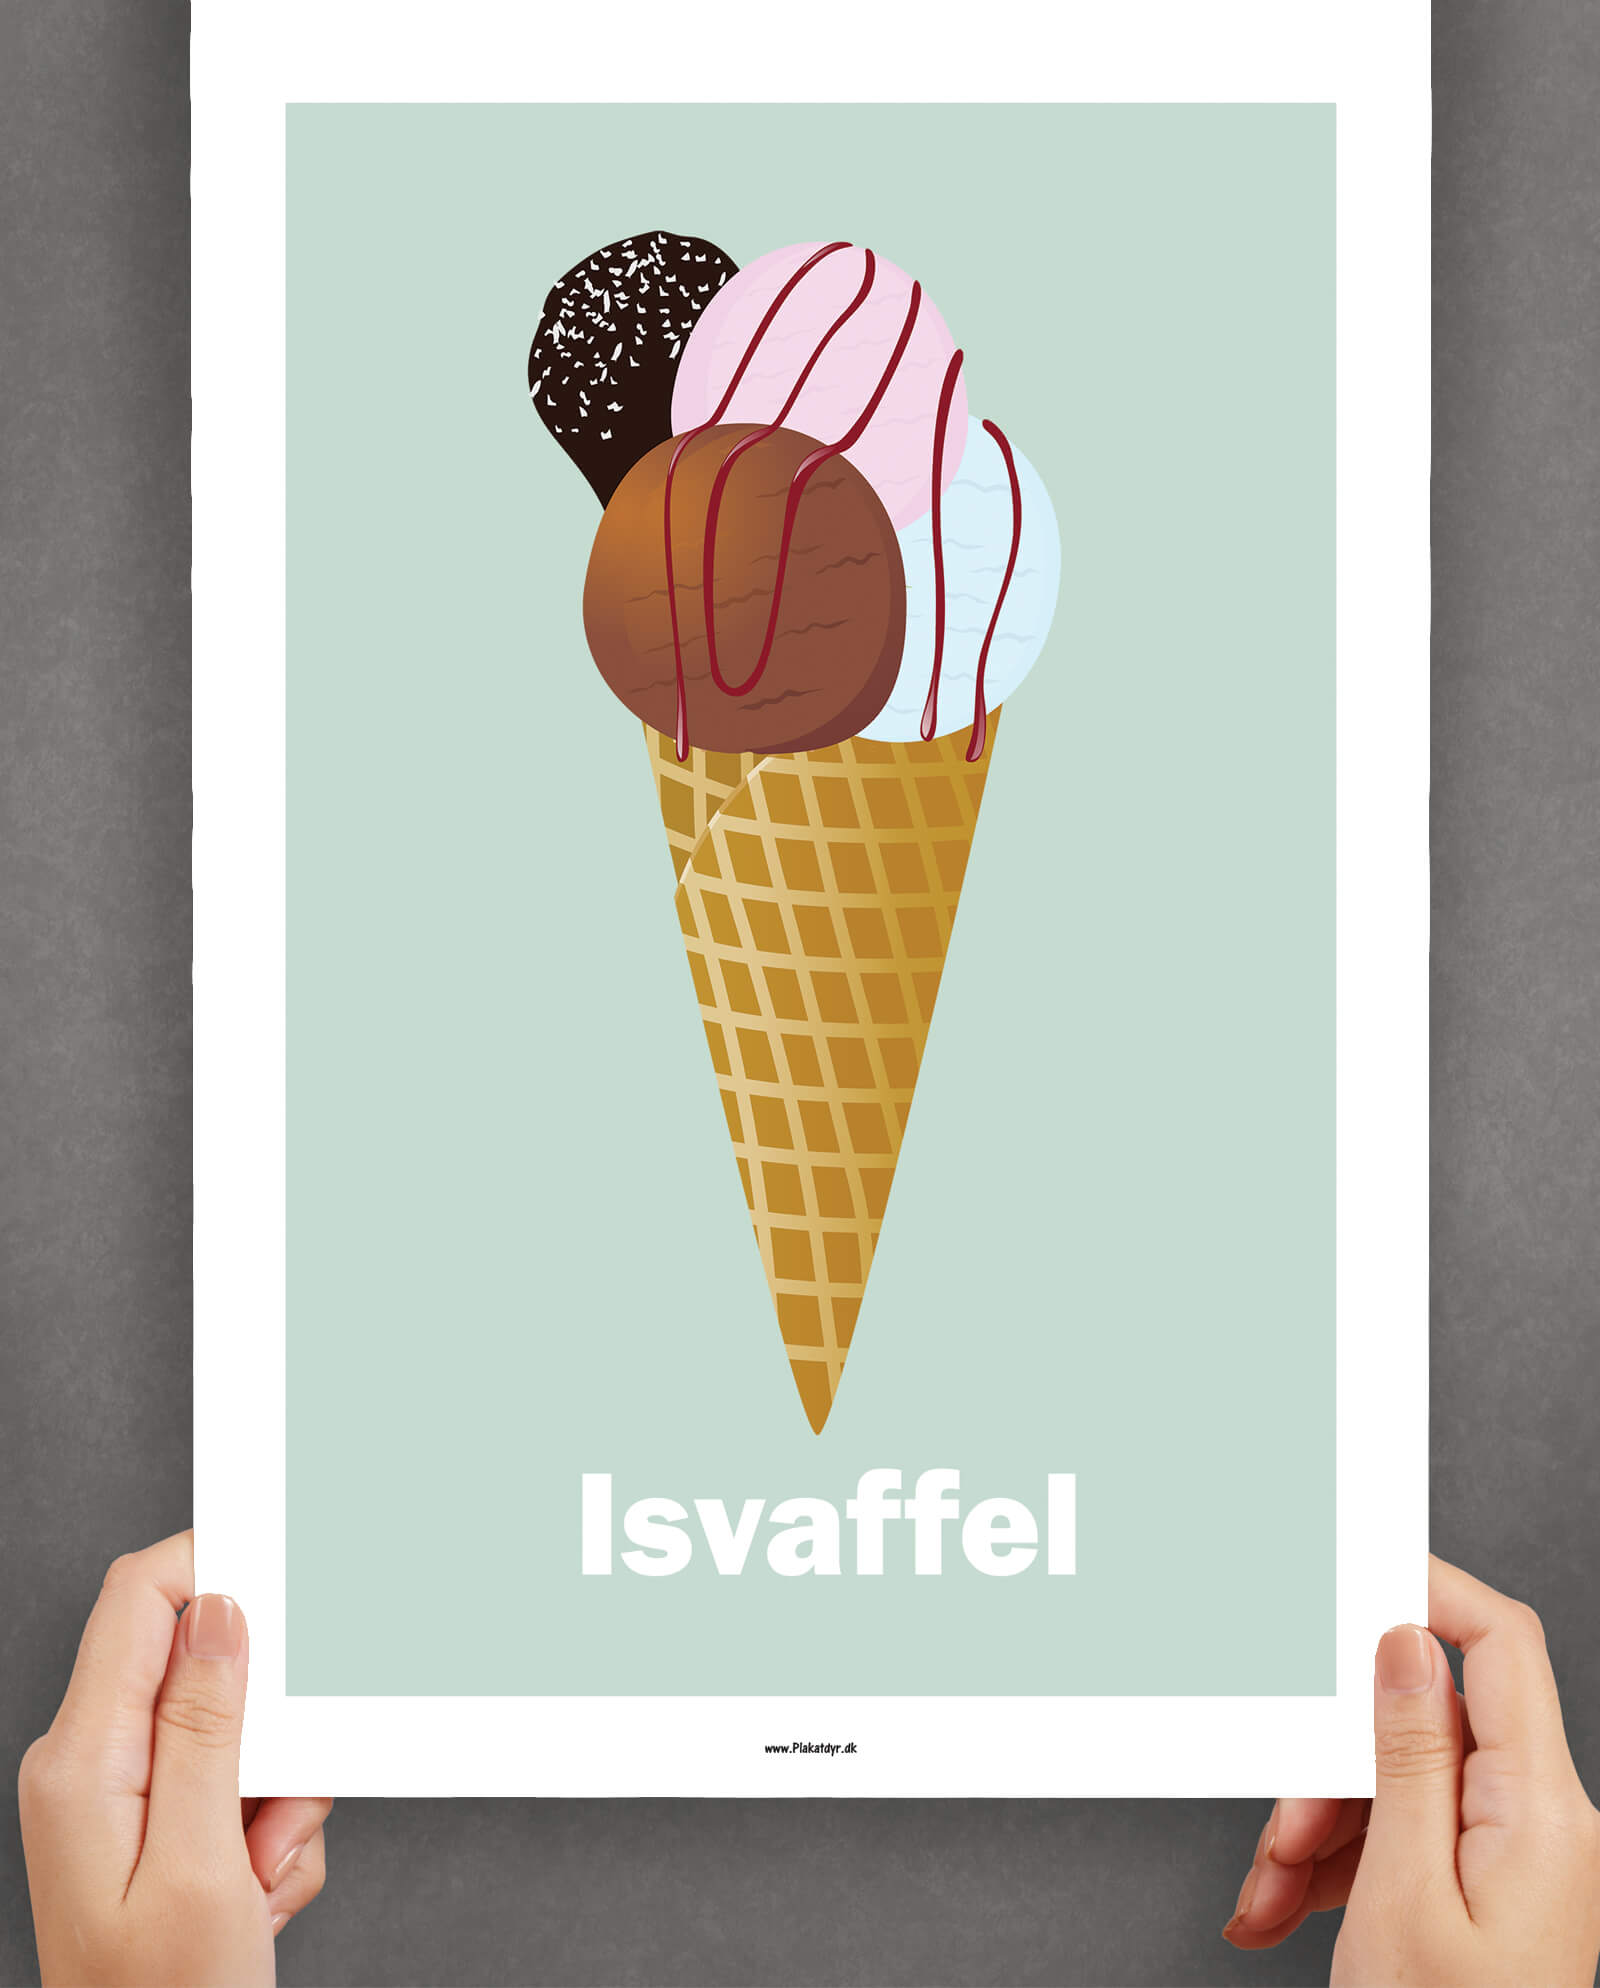 isvaffel-plakat-groen-1